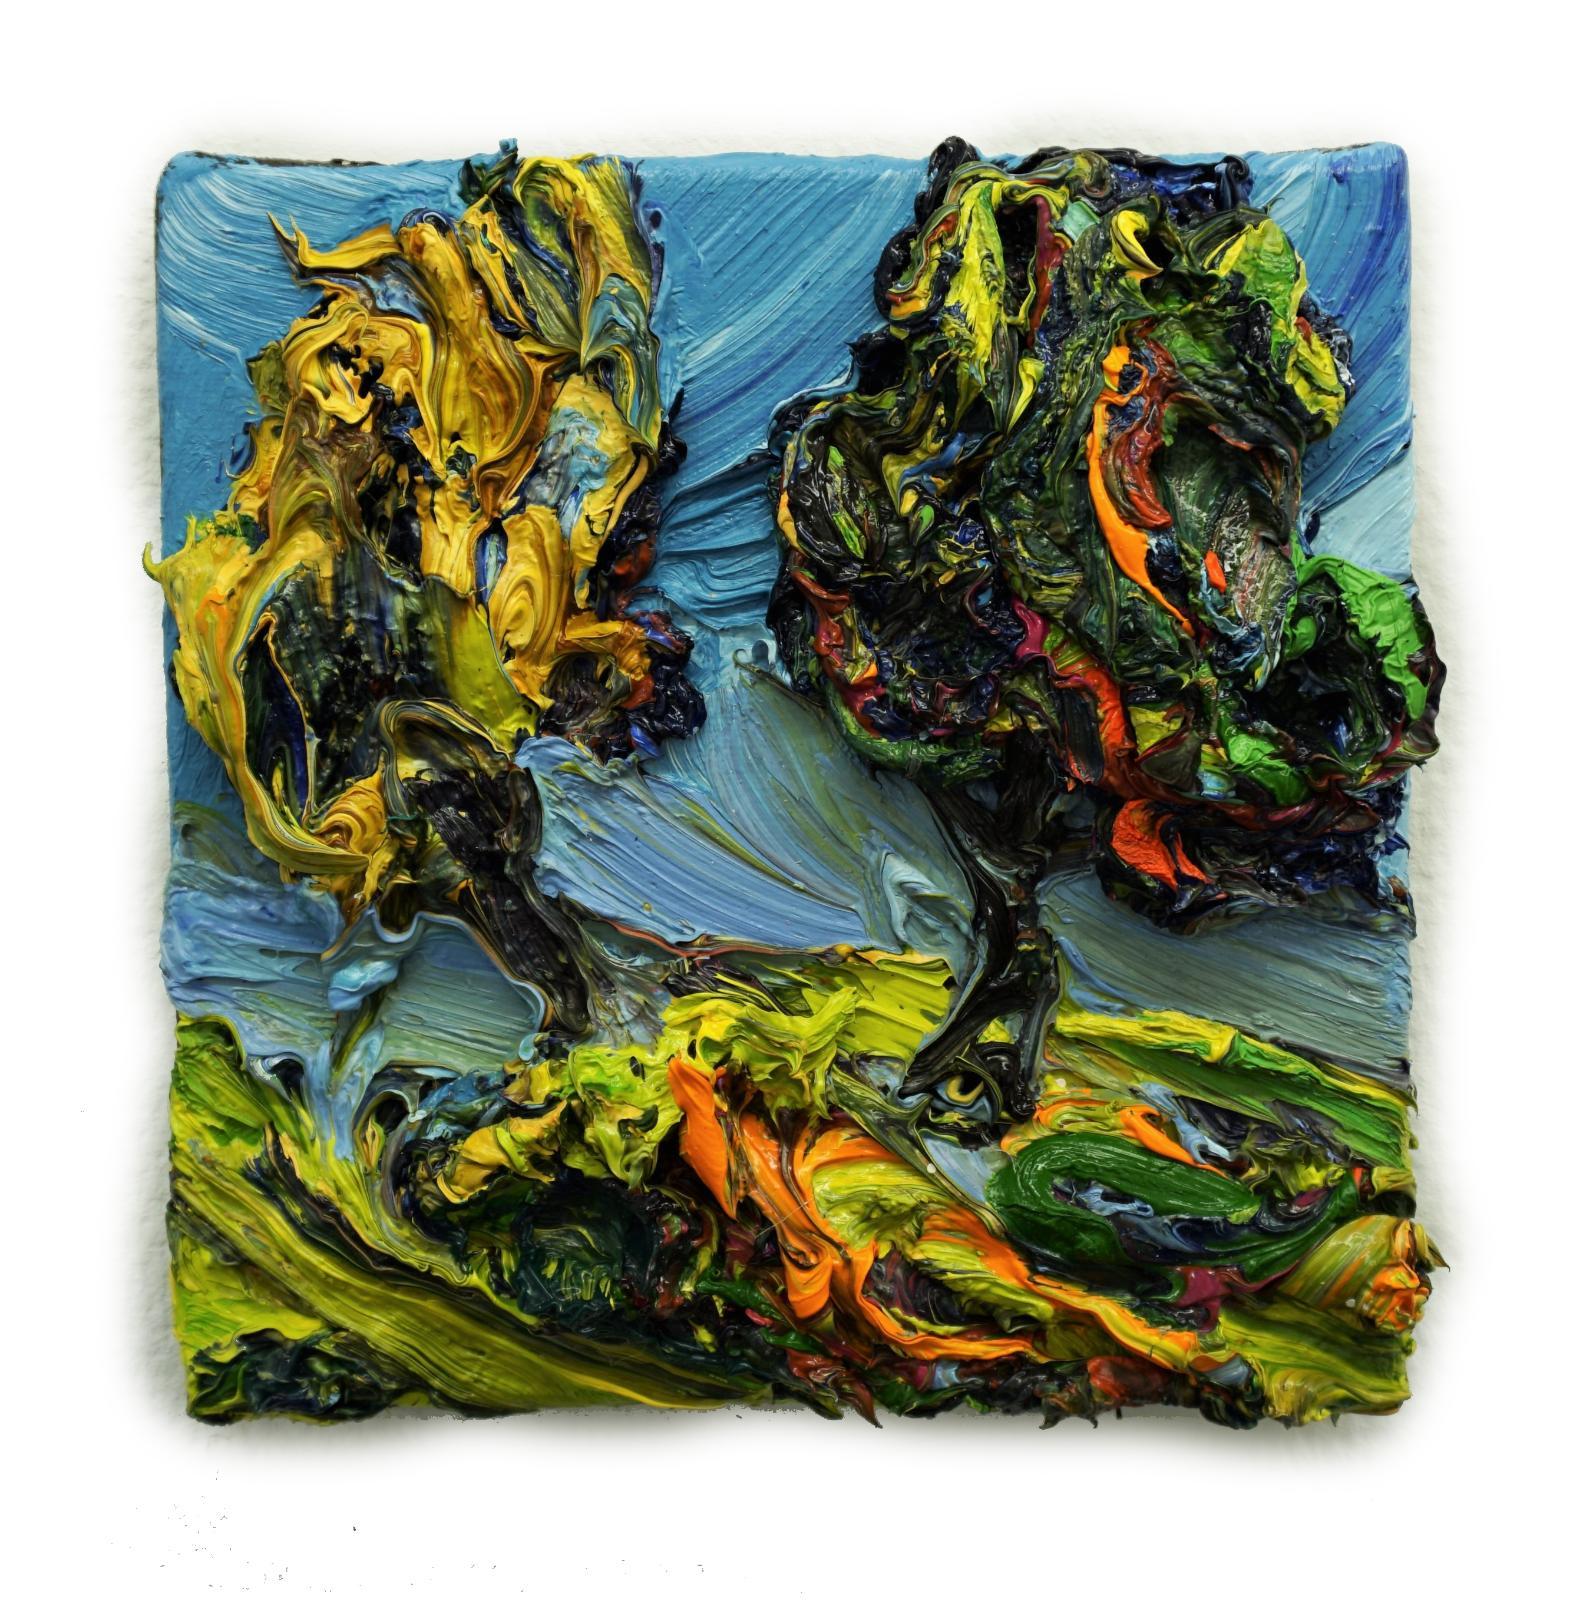 Harry Meyer, Baum, 2020, Öl auf Leinwand, 20 x 20cm, meh004ko